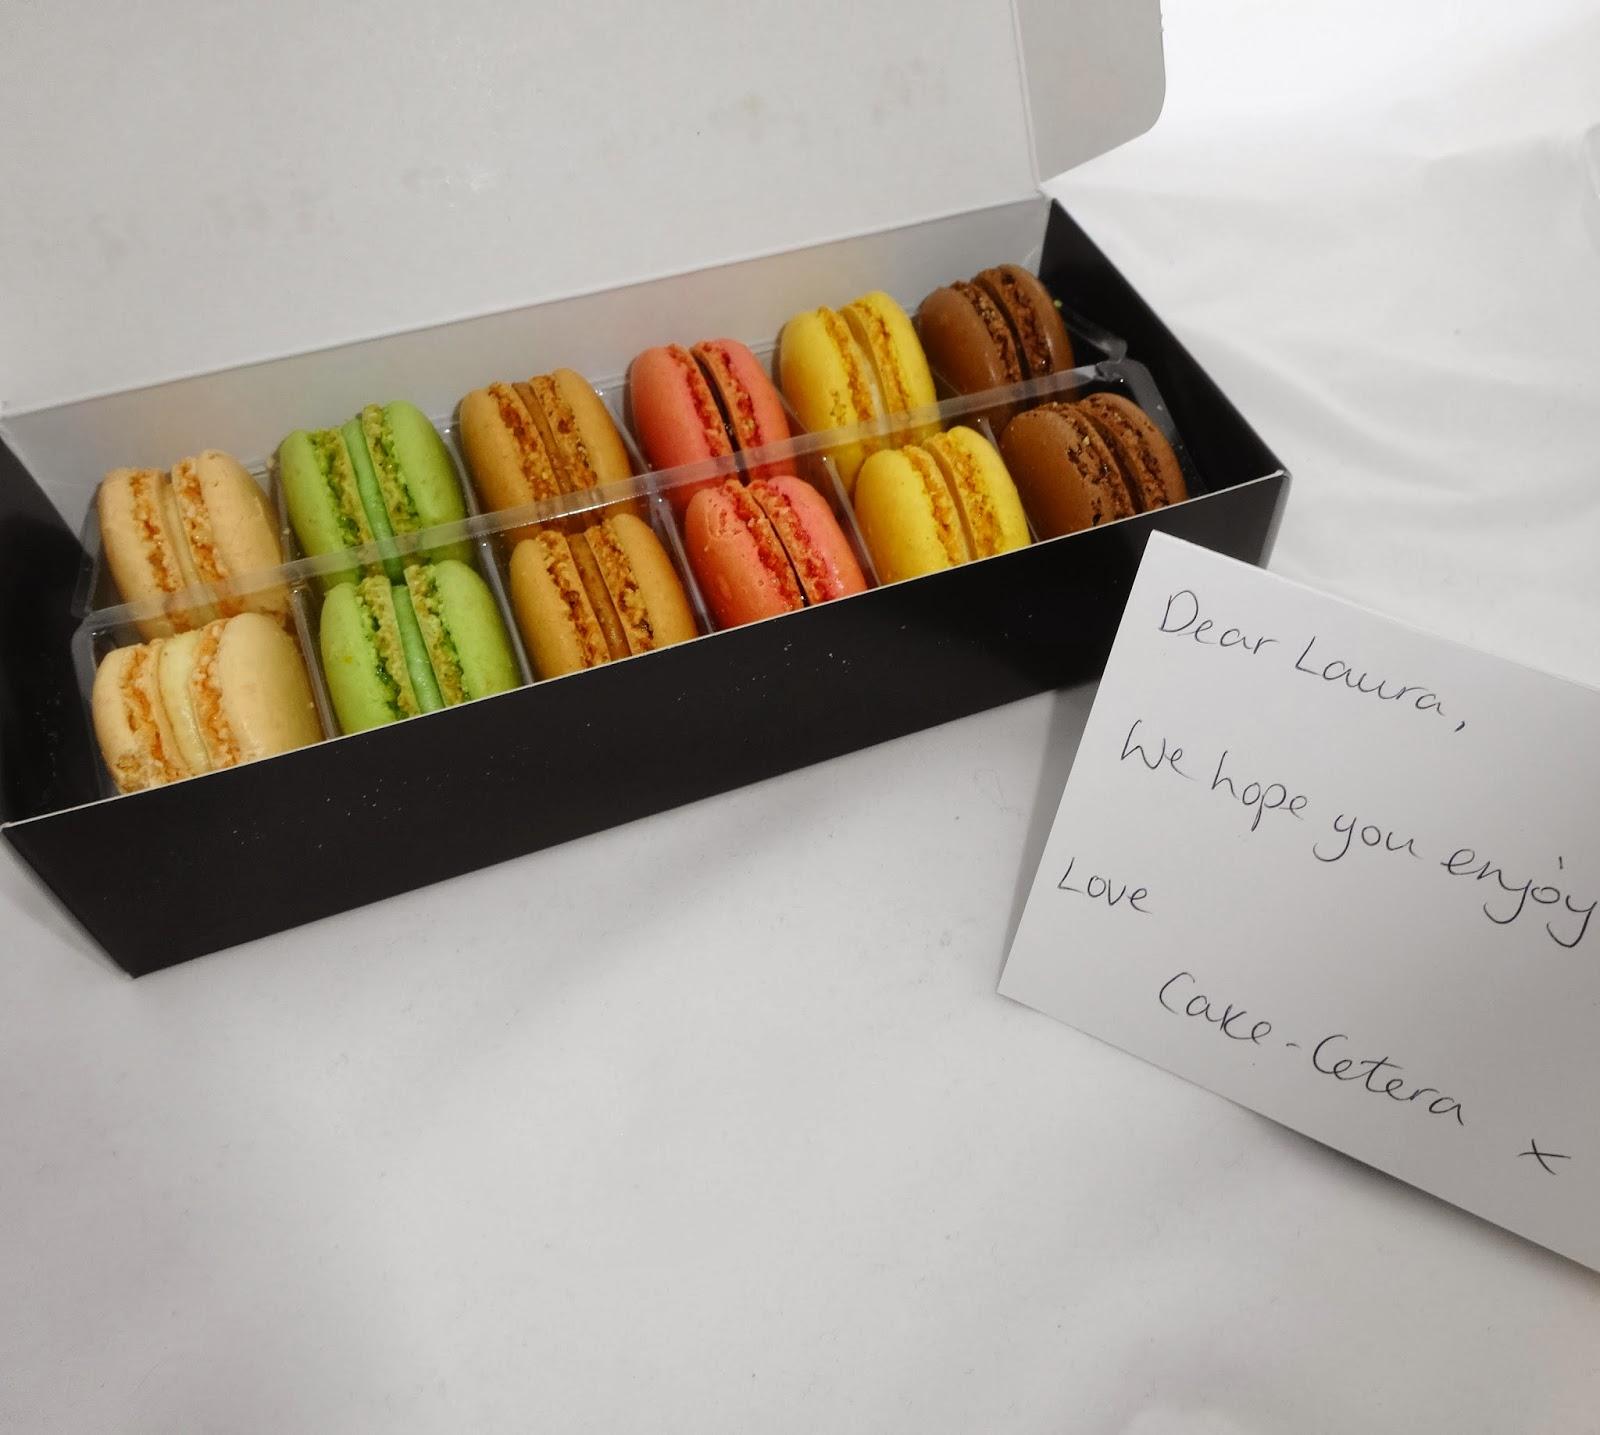 Cake Cetara Macarons